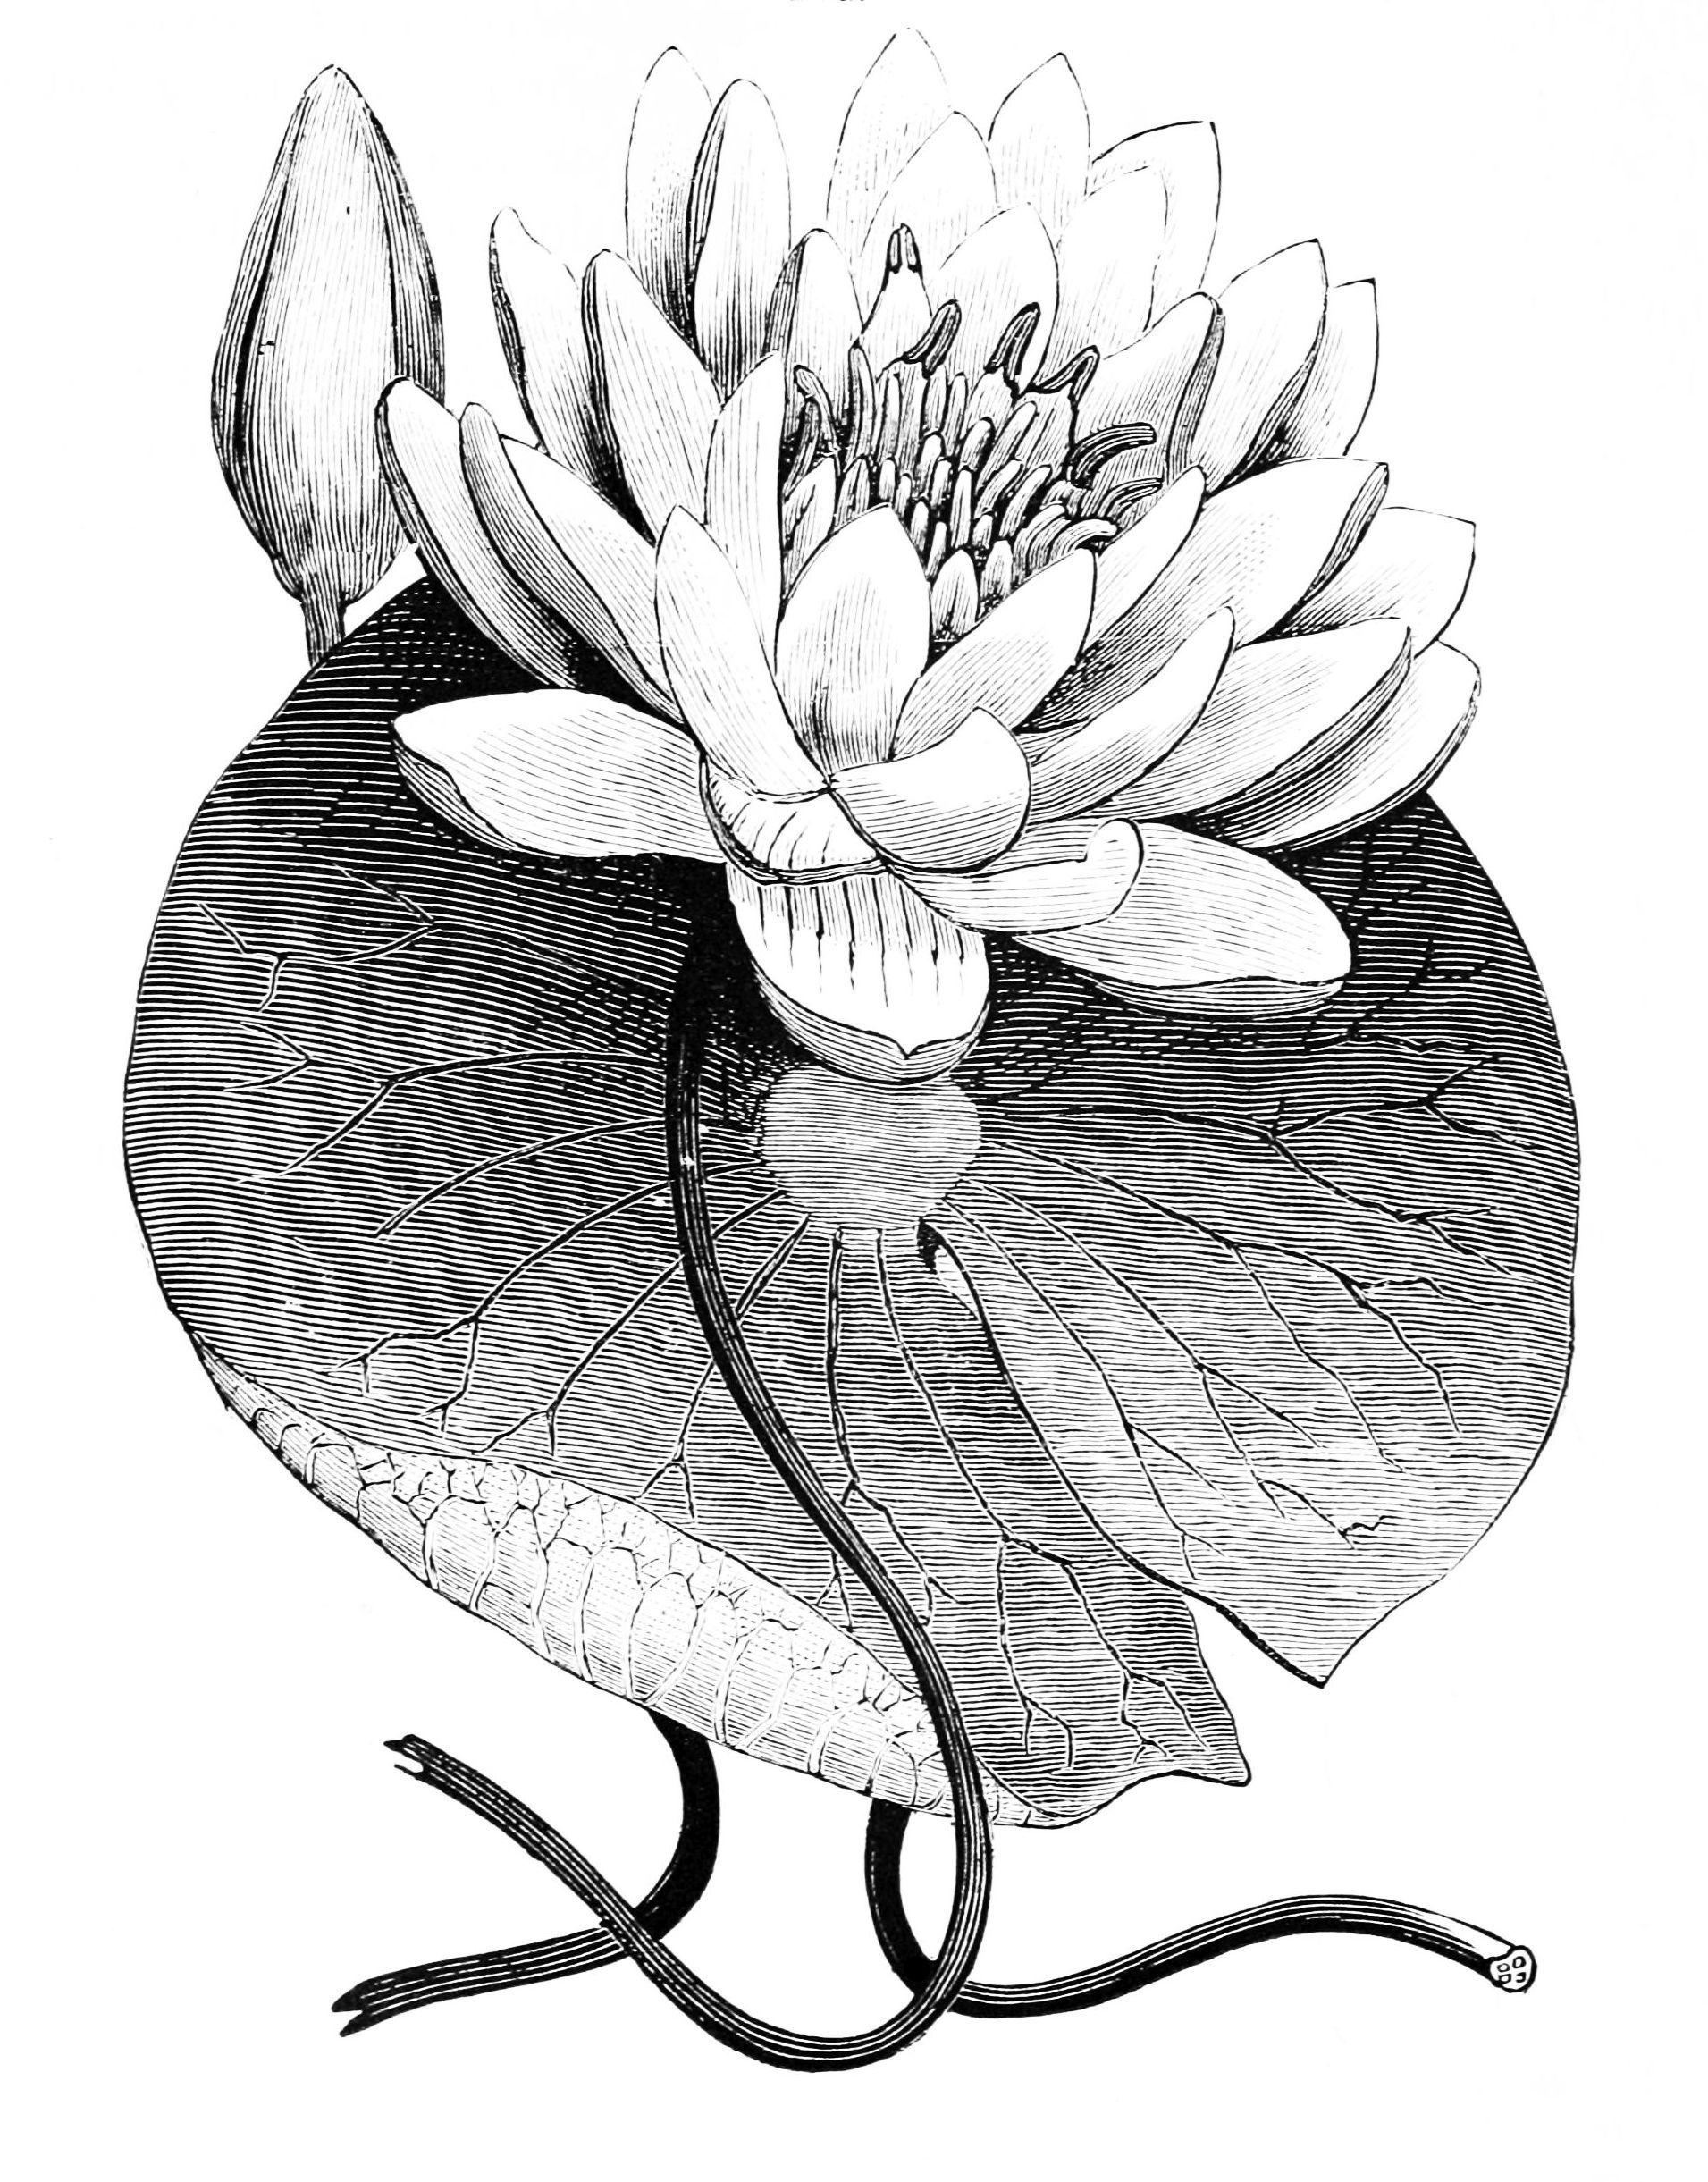 Water lily 11 am option 2 clock tattoo brucius pinterest water lily 11 am option 2 izmirmasajfo